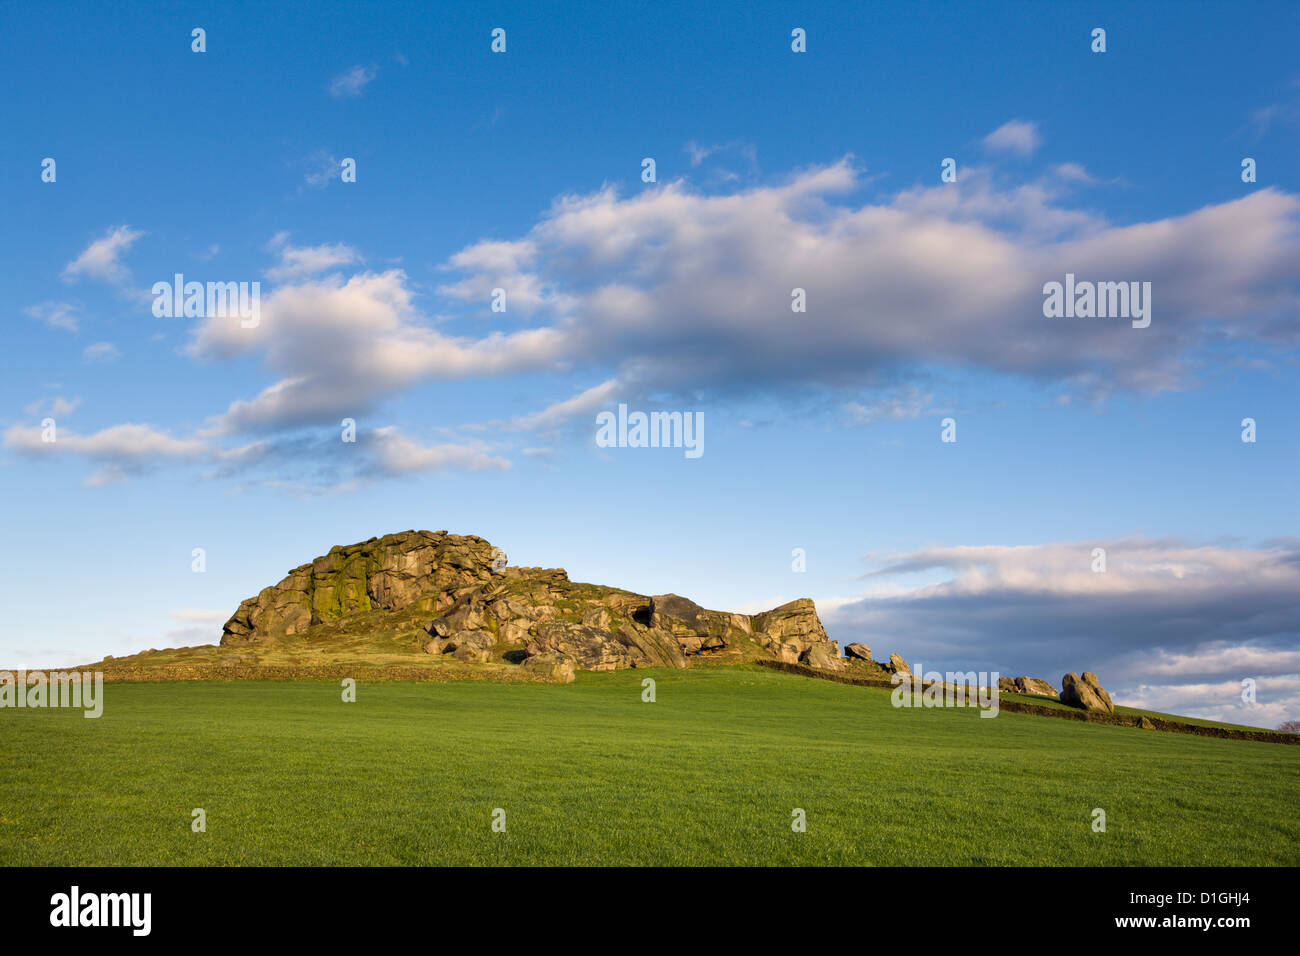 Evening light on Almscliff Crag in Spring, North Yorkshire, Yorkshire, England, United Kingdom, Europe - Stock Image